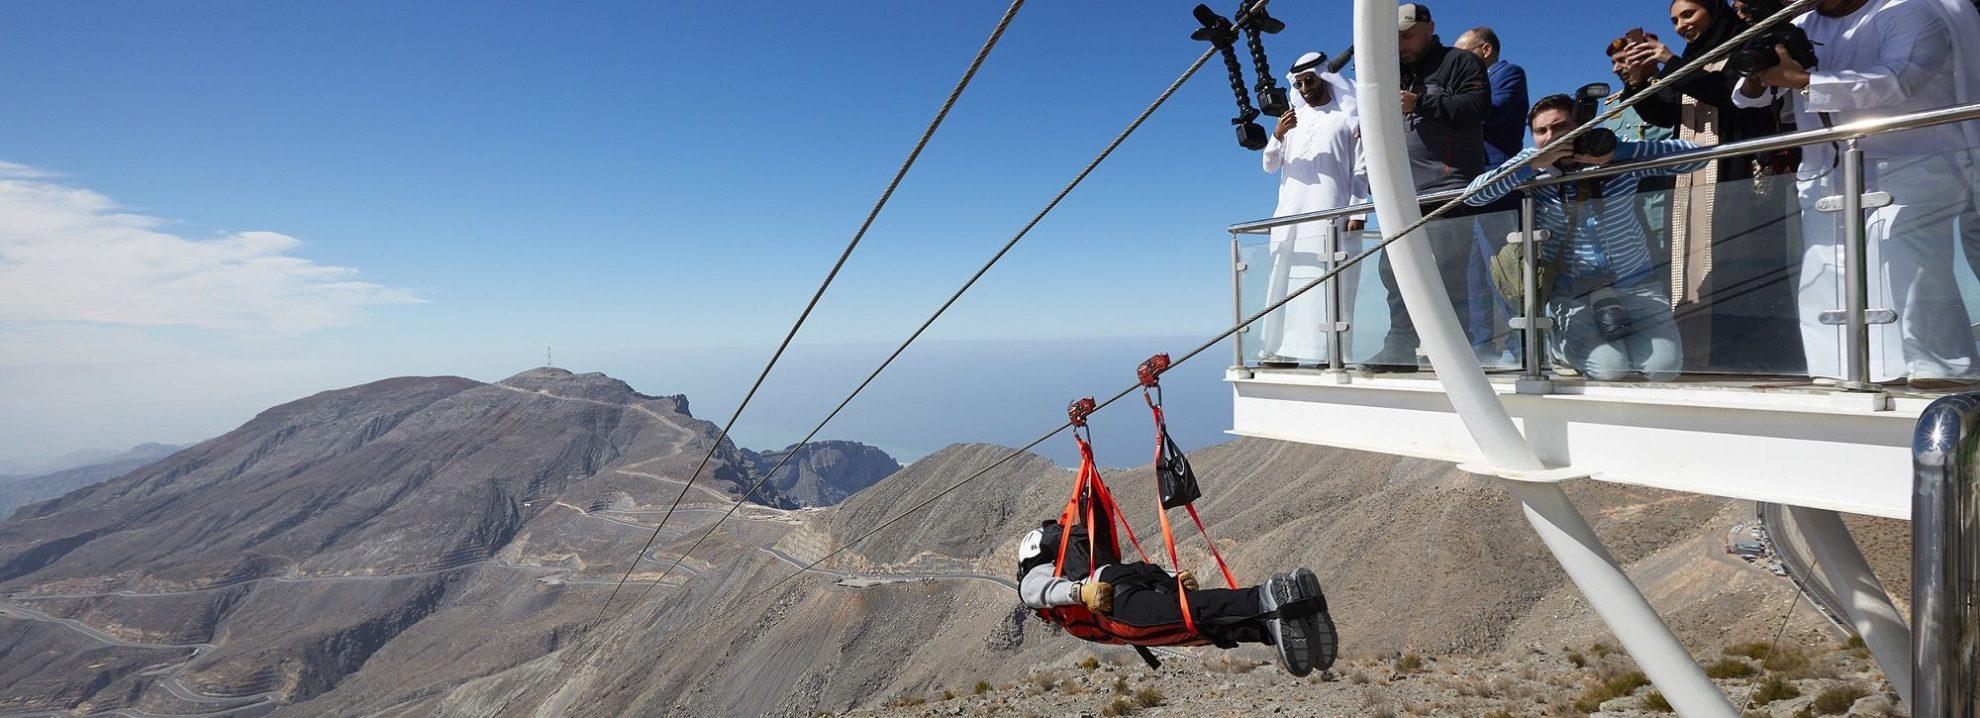 markettiers launches world's longest zip-line in the UAE